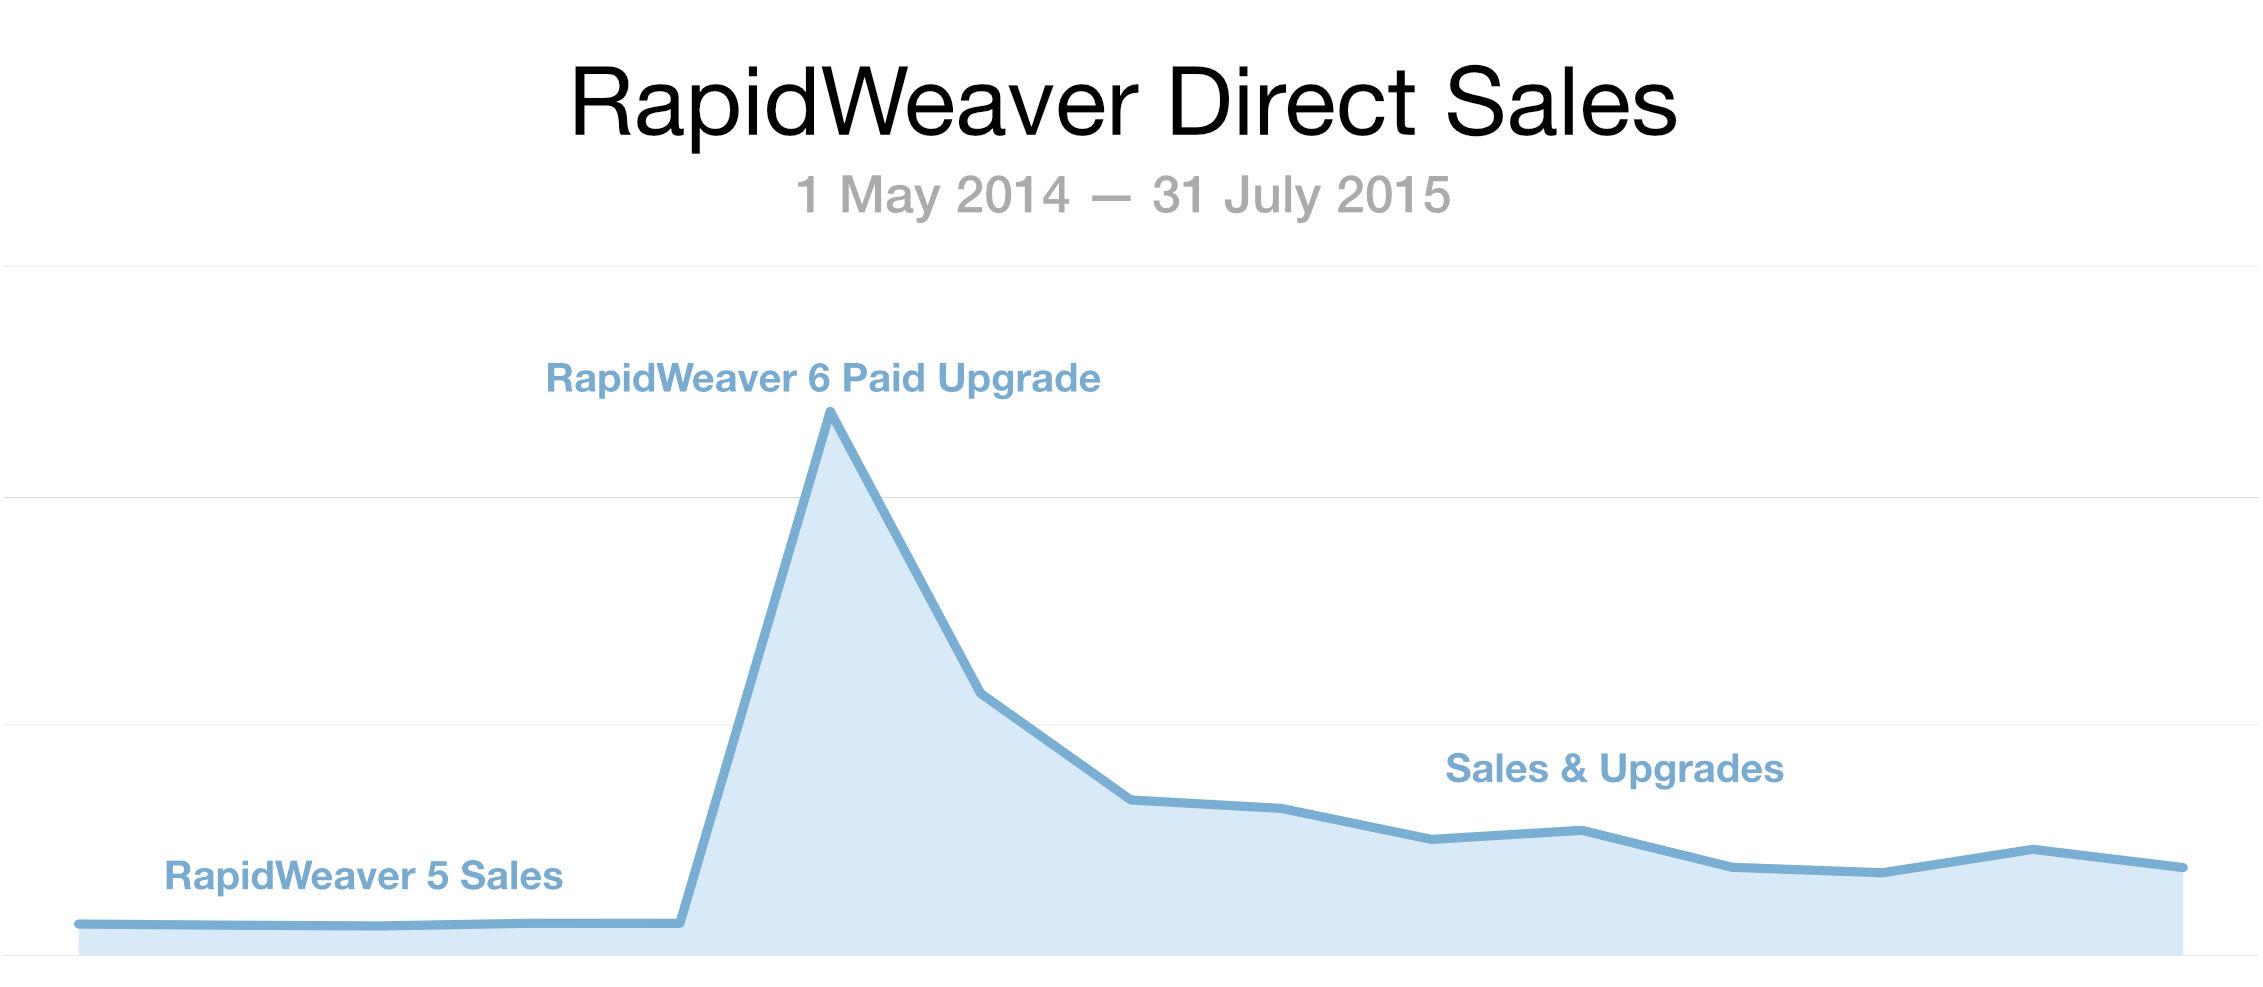 RapidWeaver sales chart